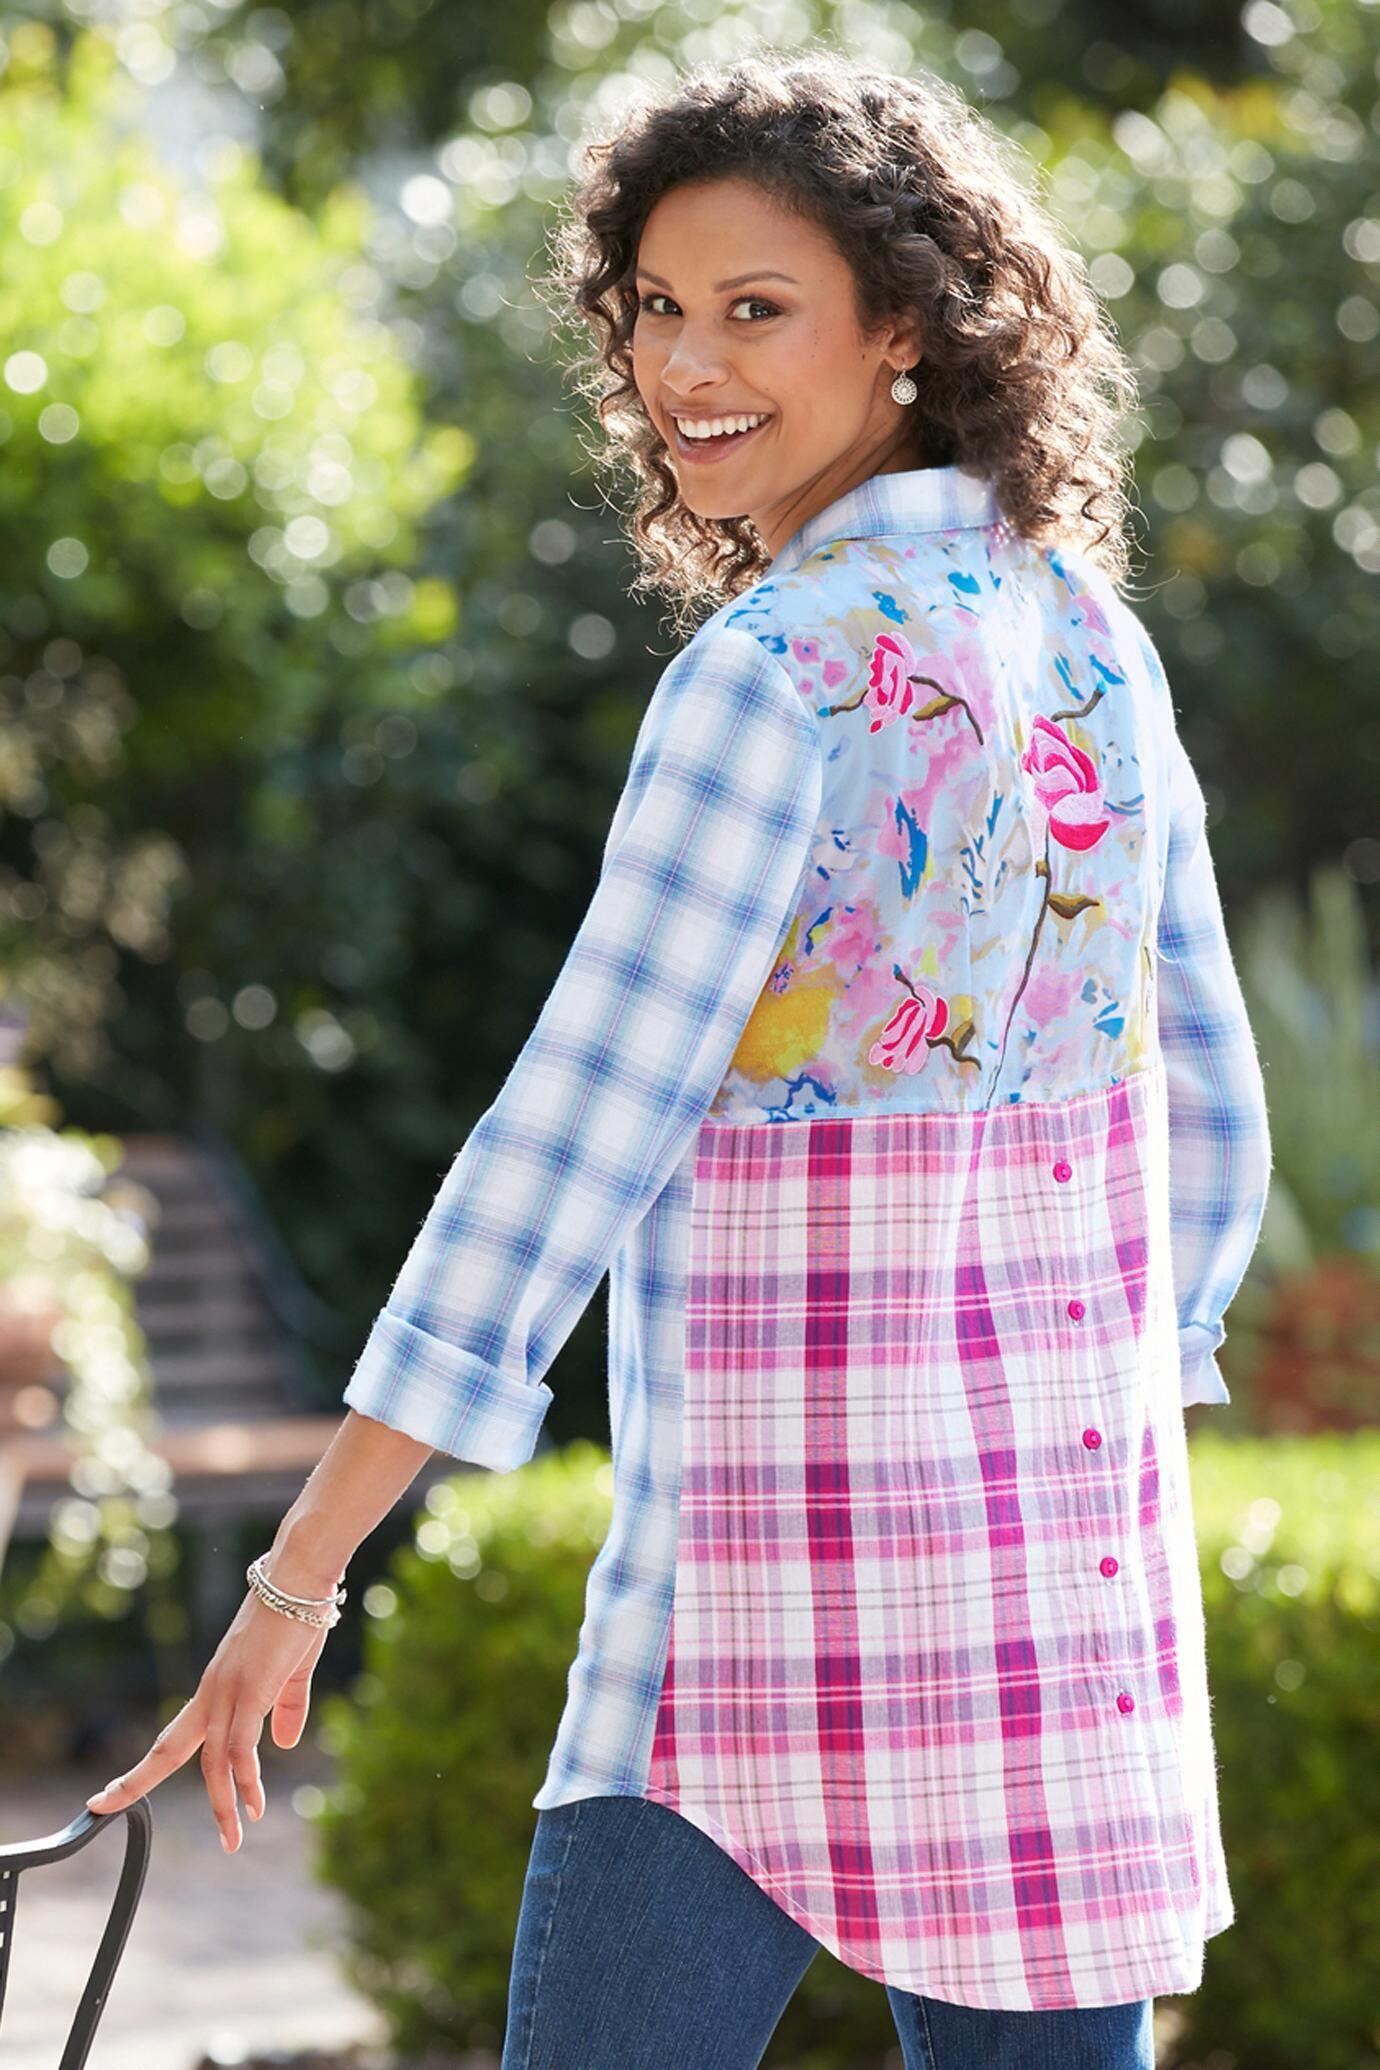 09342b5836 Trio Mixed Pattern High-Low Hem Shirt. In style plaid shirt for fall.